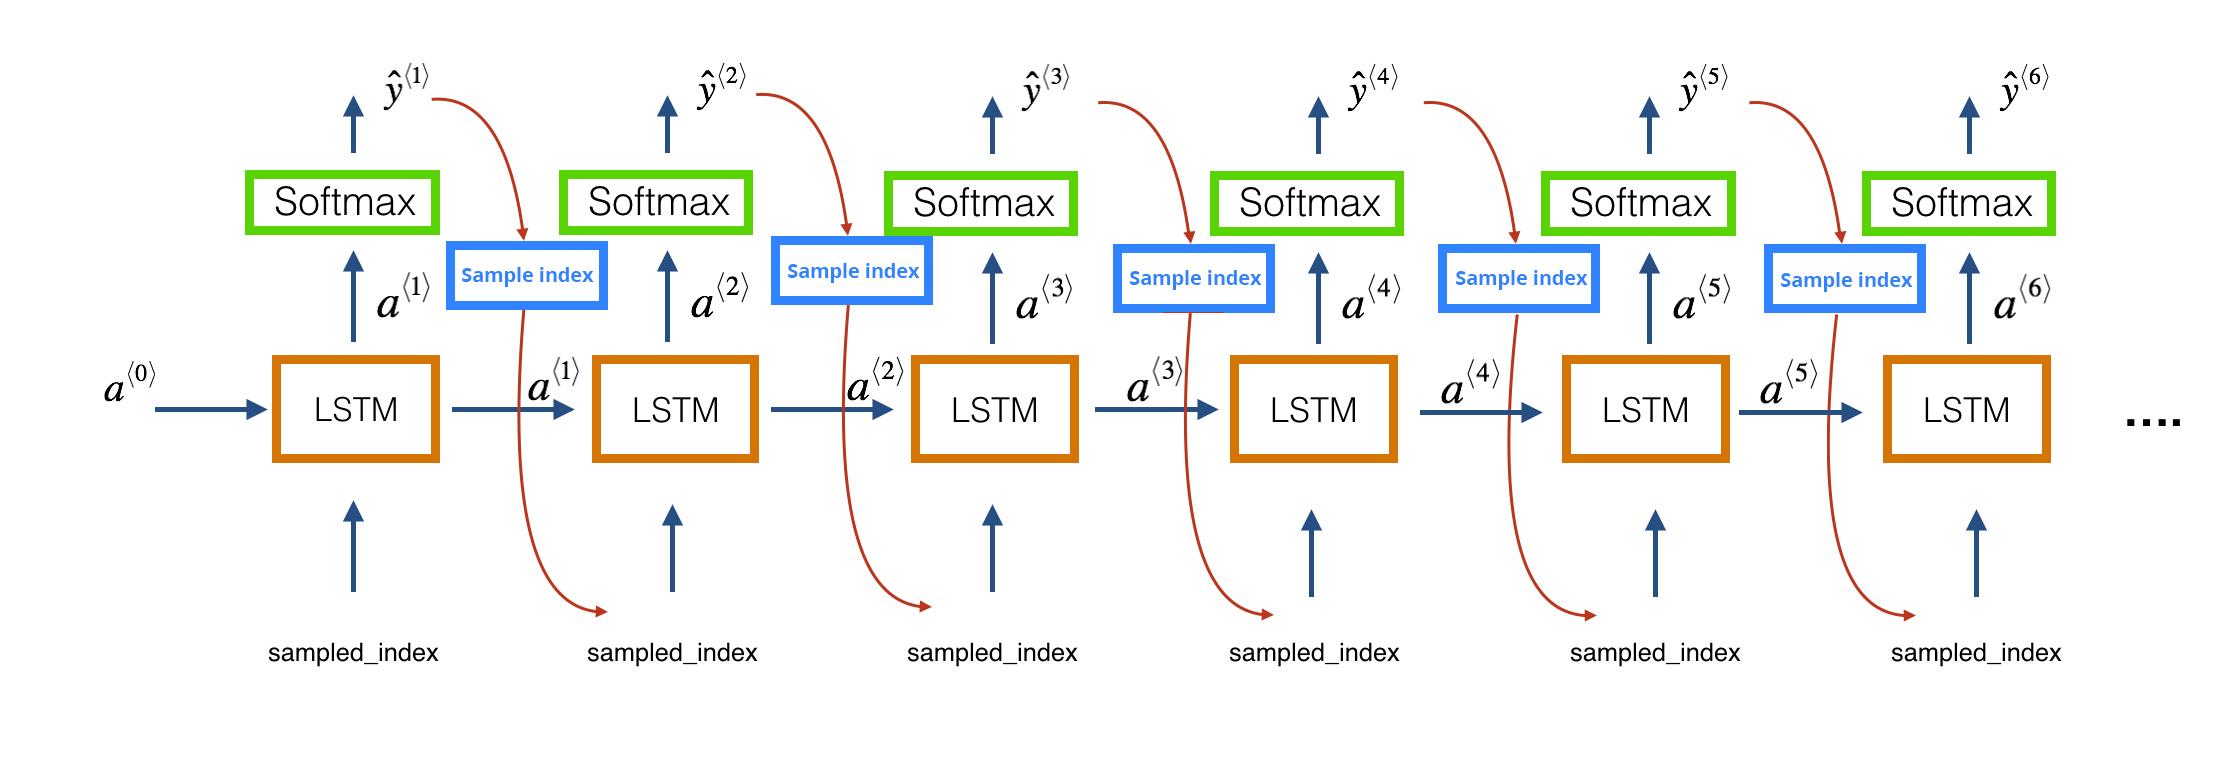 sampling, sampling from rnn, LSTM, architecture, music sampling, music generation